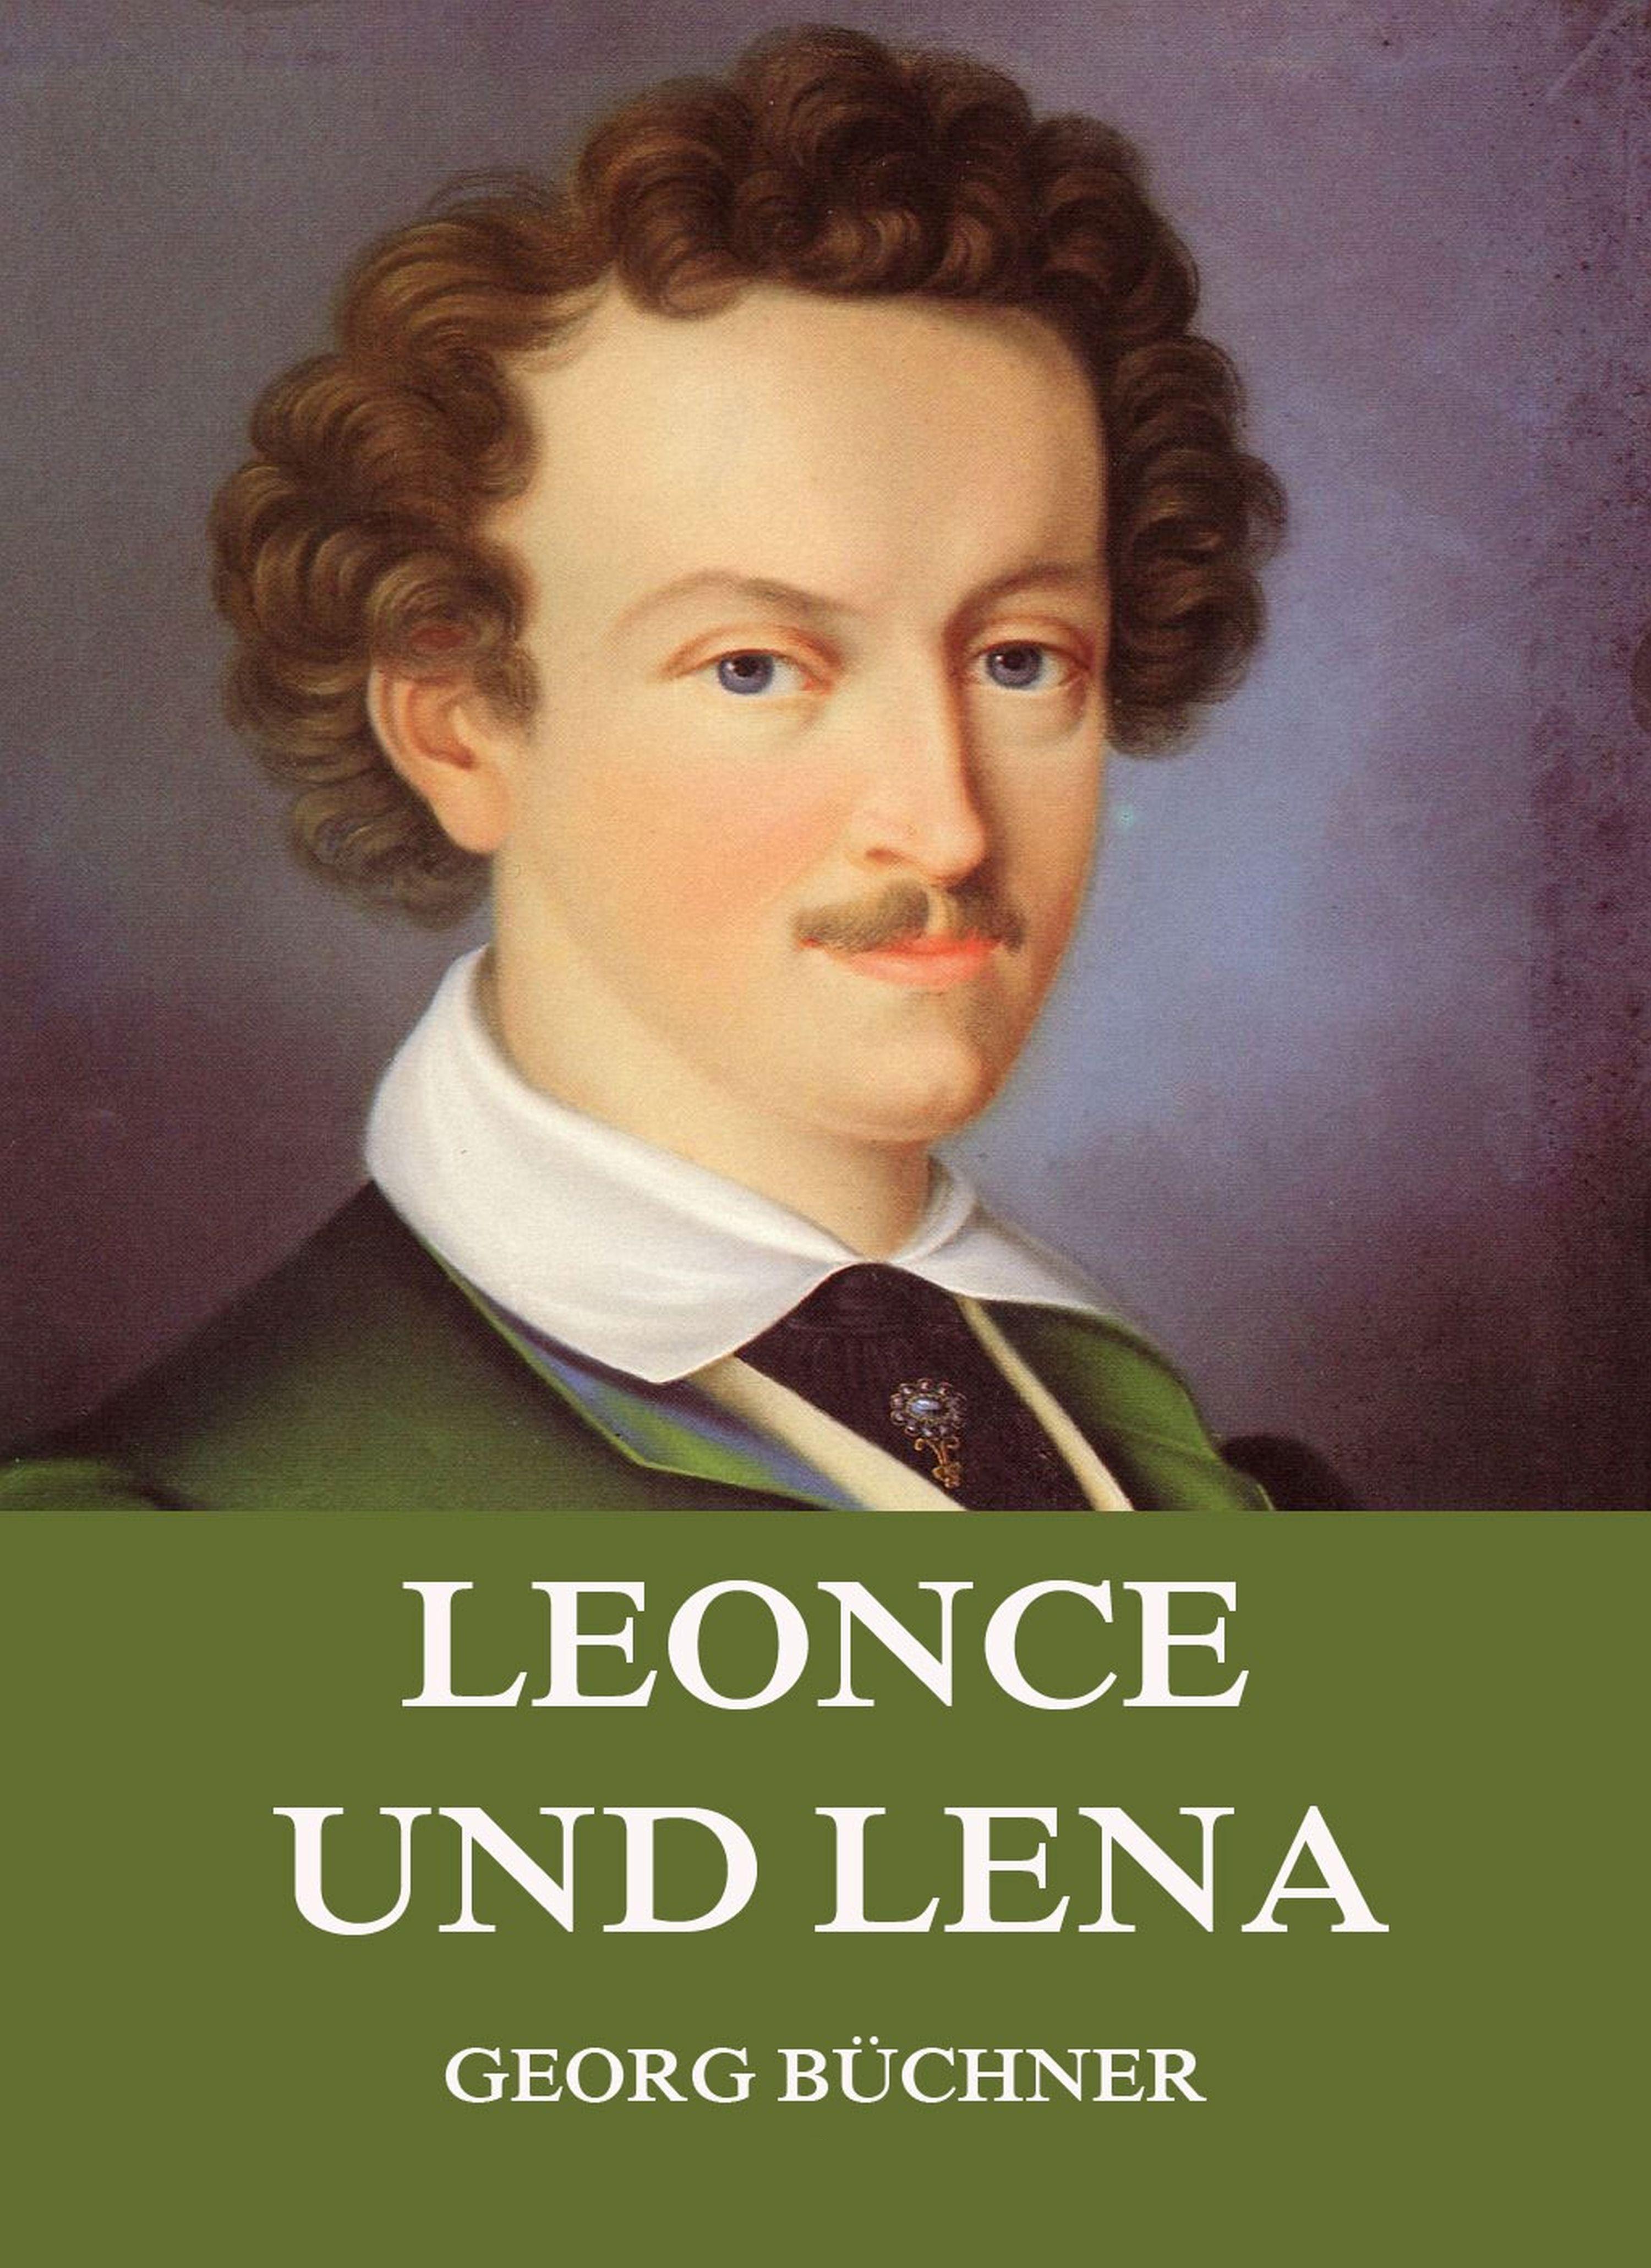 Фото - Georg Büchner Leonce und Lena woyzeck leonce und lena